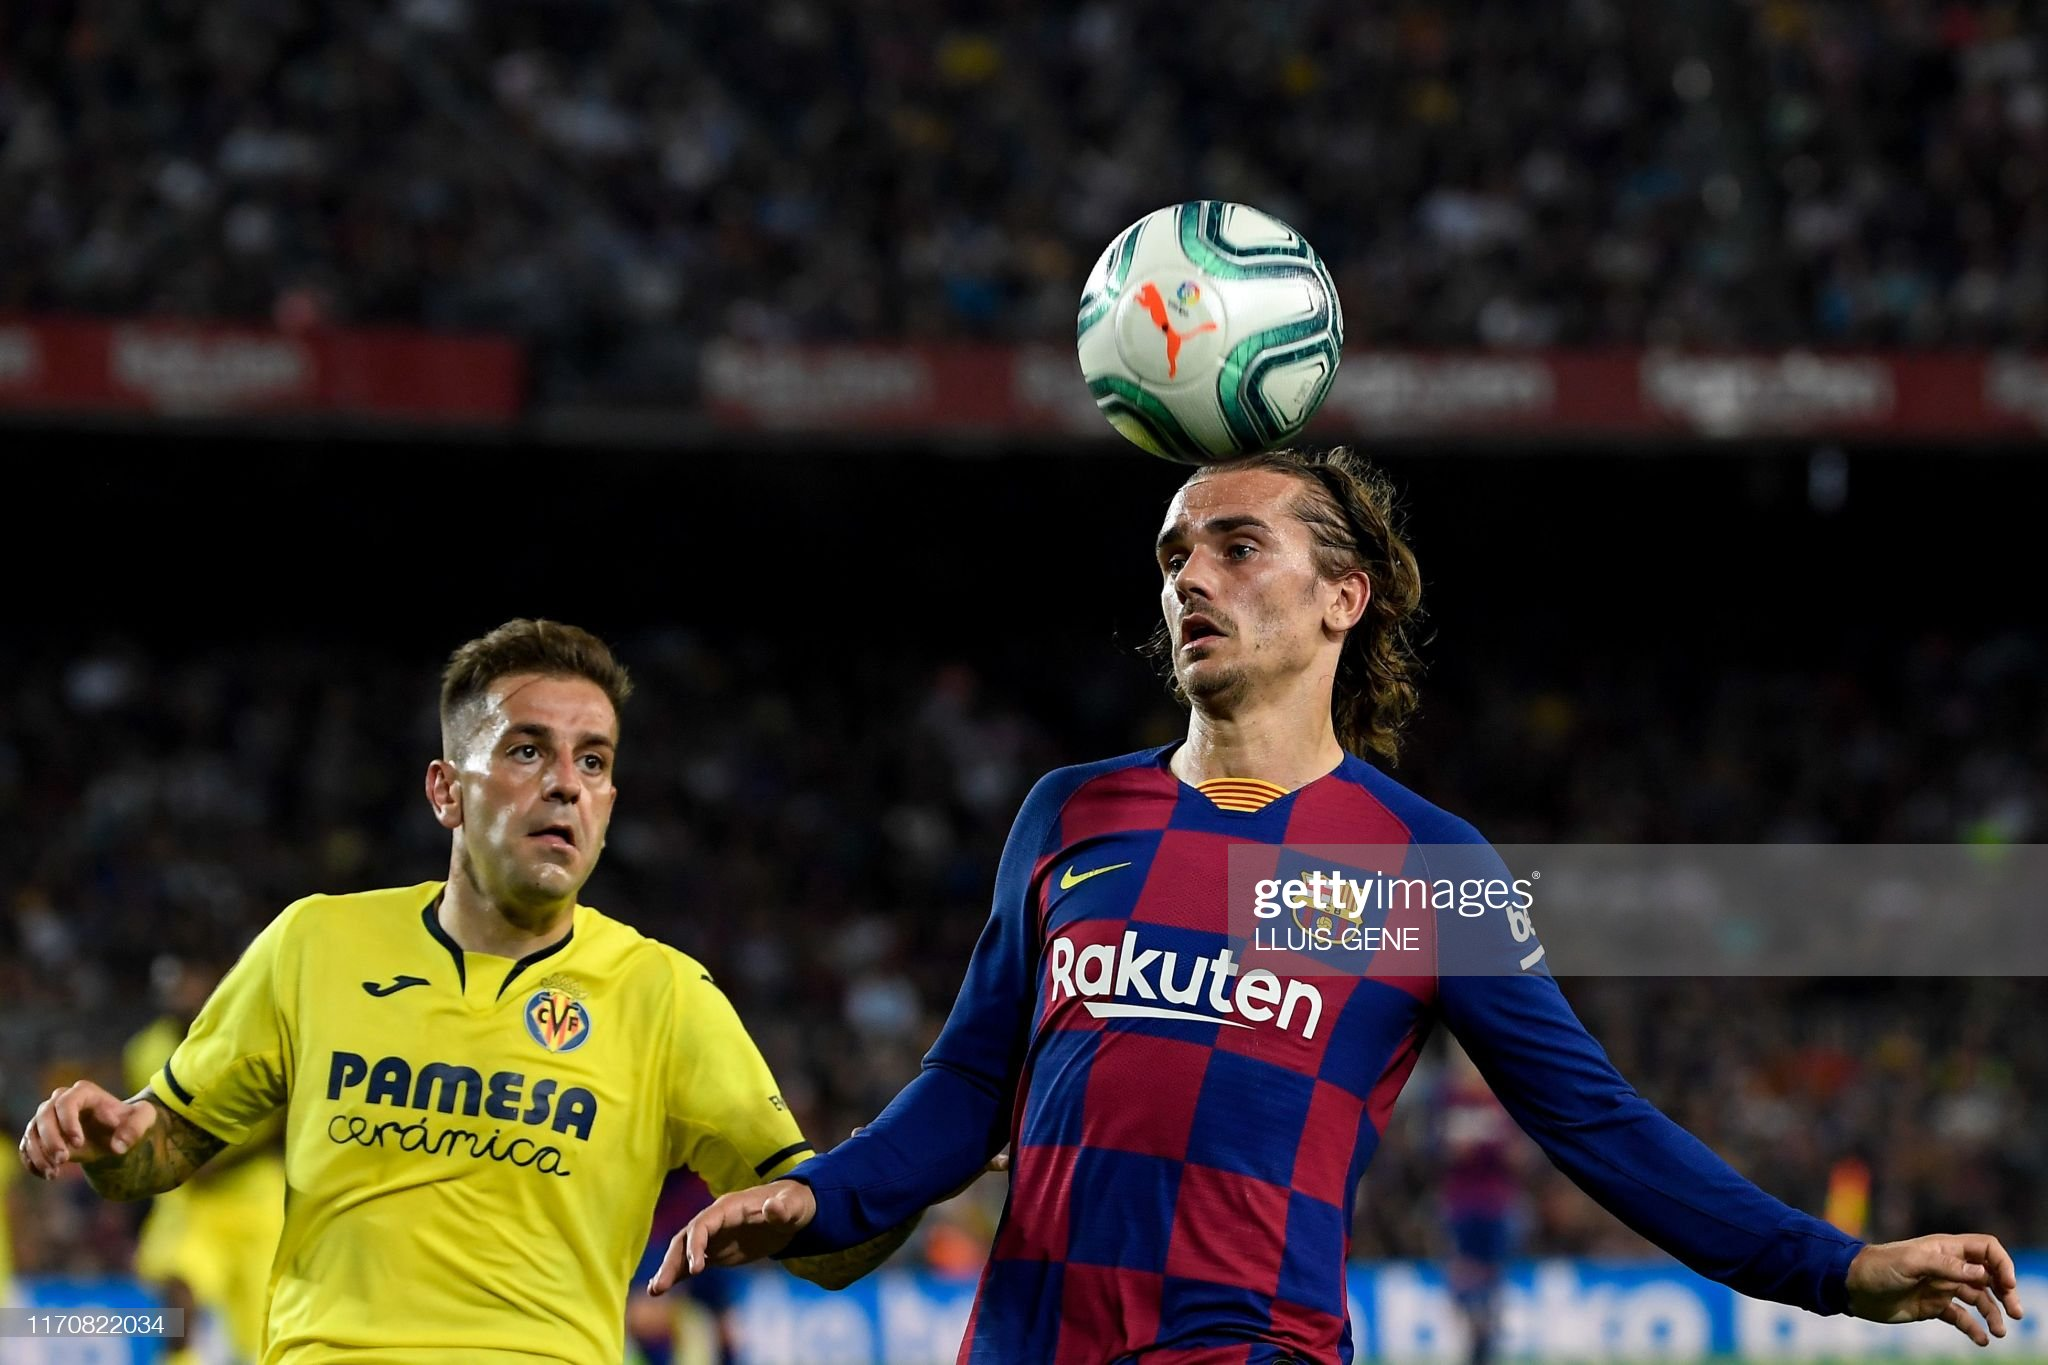 صور مباراة : برشلونة - فياريال 2-1 ( 24-09-2019 )  Barcelonas-french-forward-antoine-griezmann-heads-the-ball-next-to-picture-id1170822034?s=2048x2048